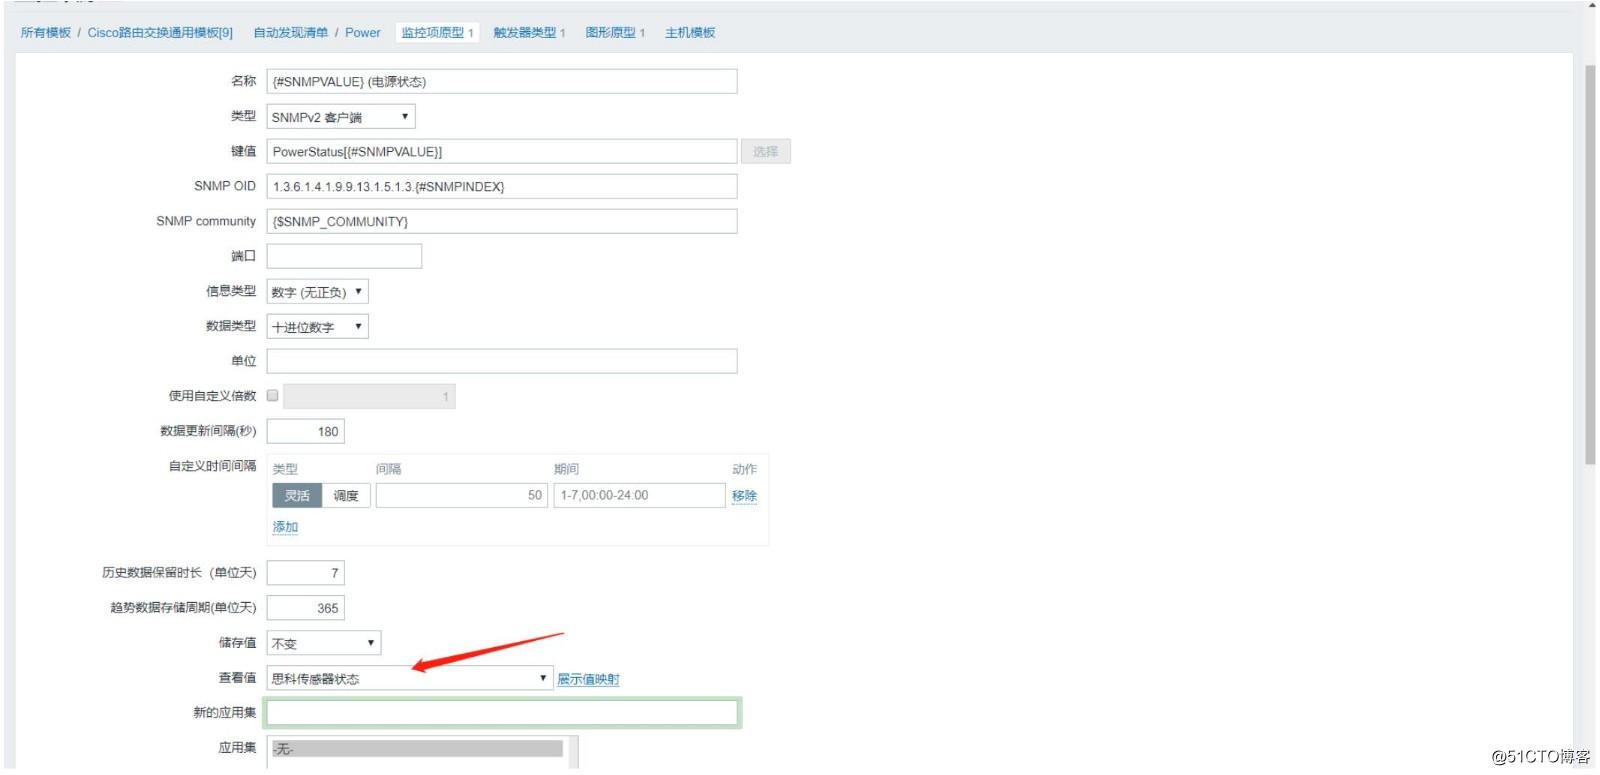 Zabbix] technology exchange analysis MIB MIB Browser - Code